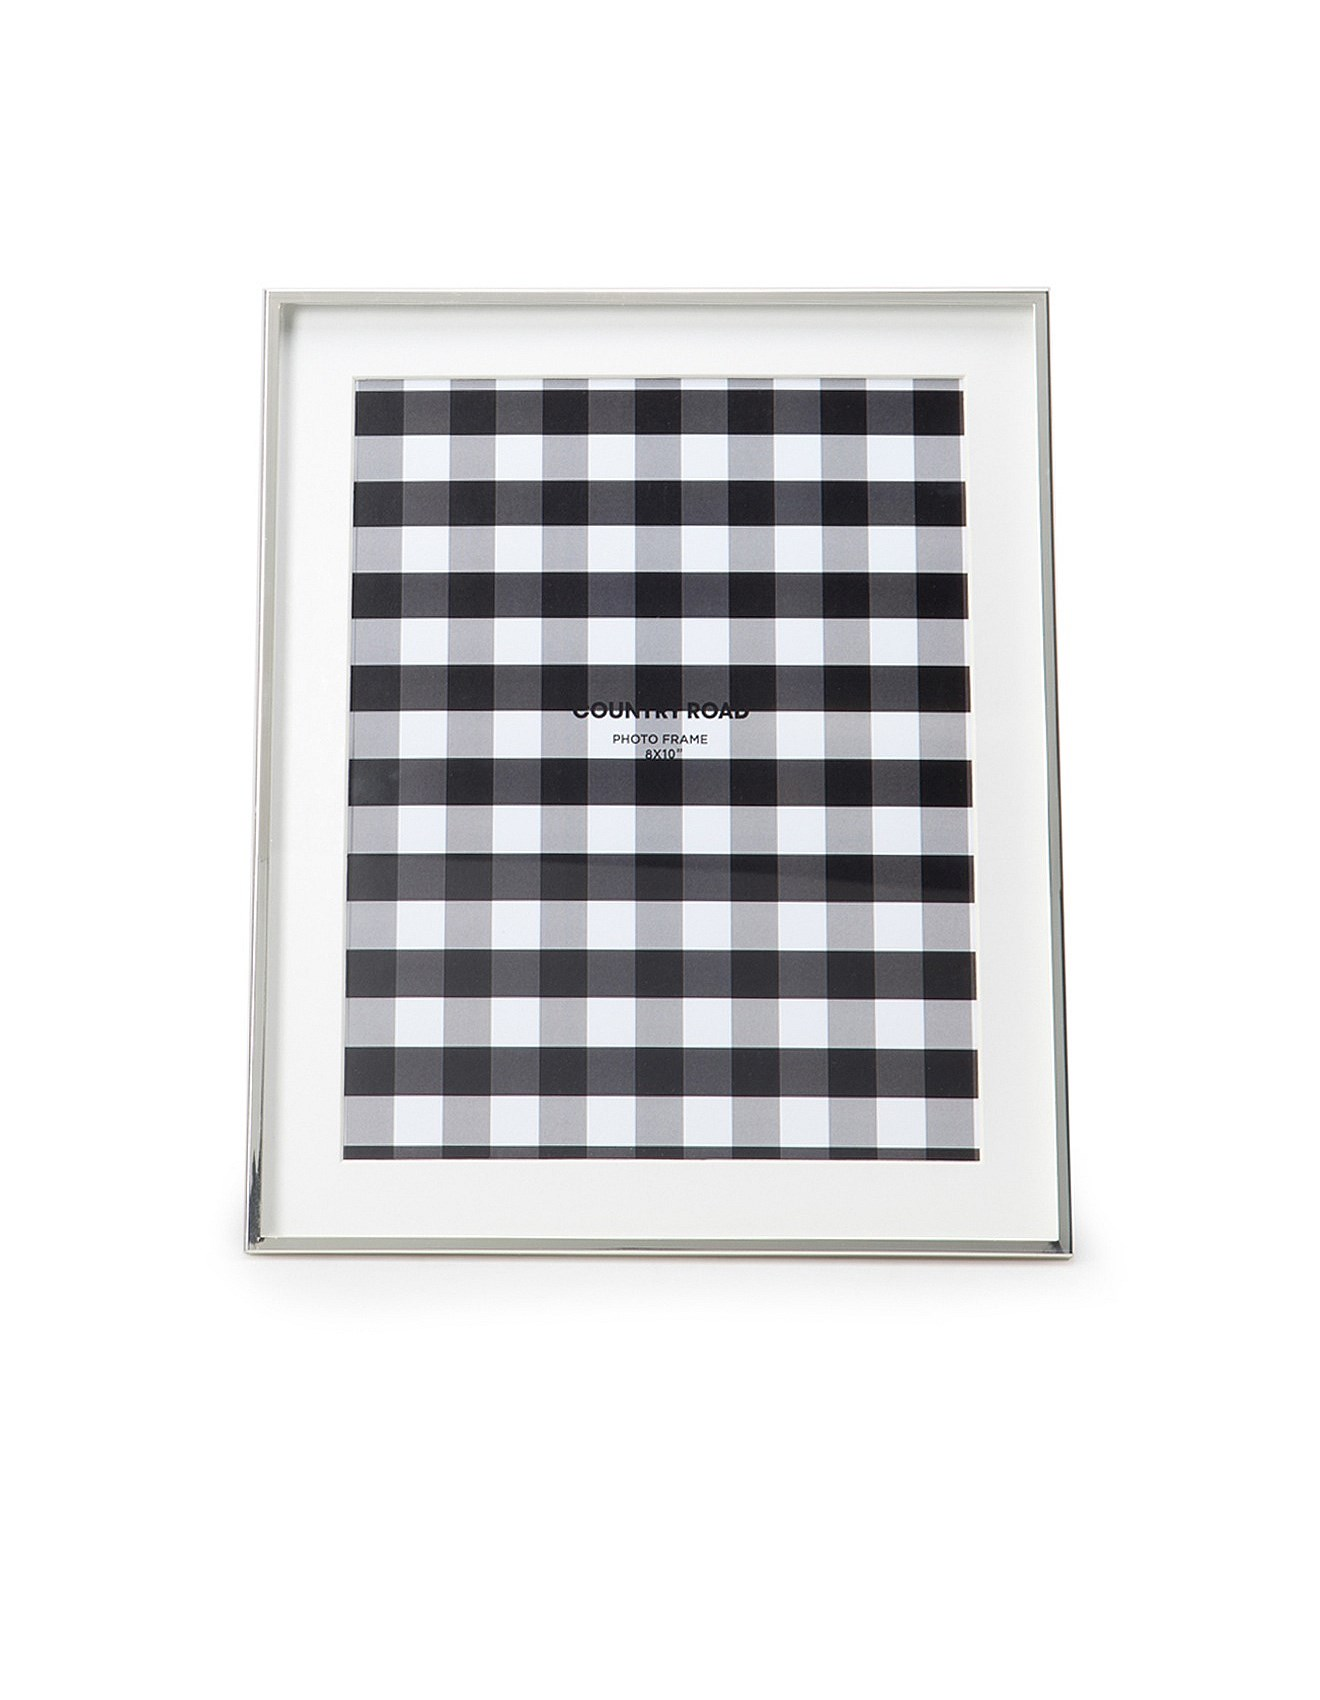 david jones photo frames | Framess.co